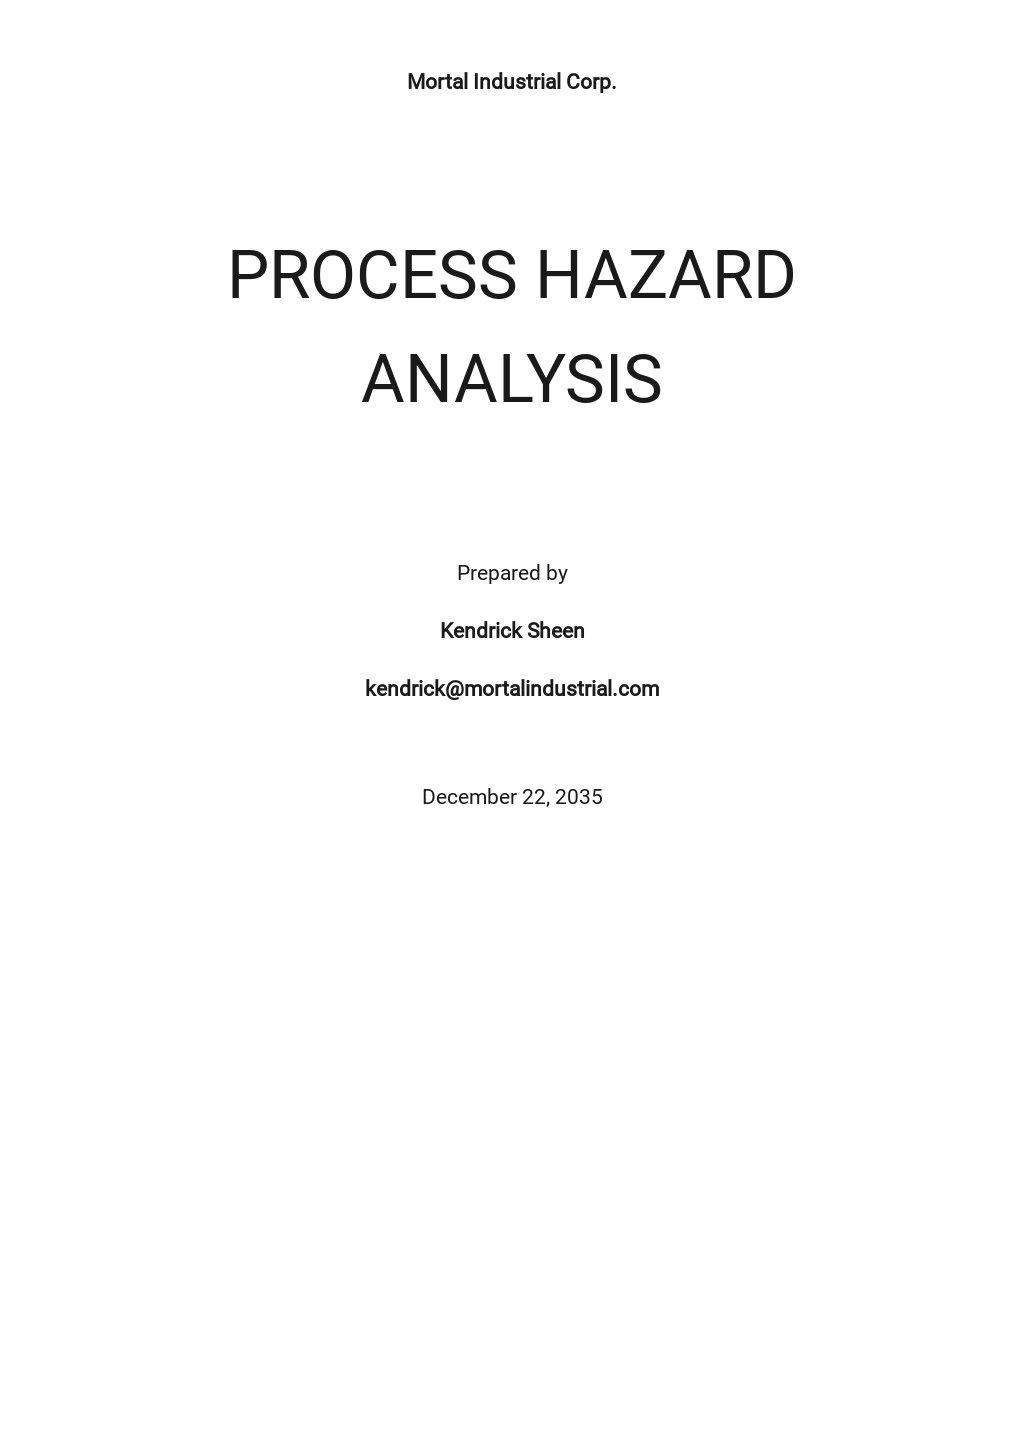 Process Hazard Analysis Template.jpe